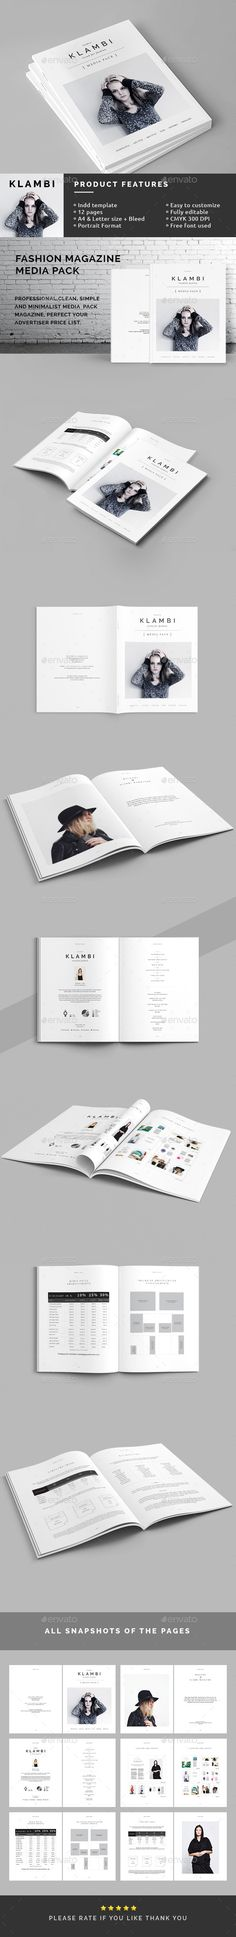 Fashion Magazine Media Pack #advertisement #ad Download : https://graphicriver.net/item/fashion-magazine-media-pack/12042844?ref=pxcr